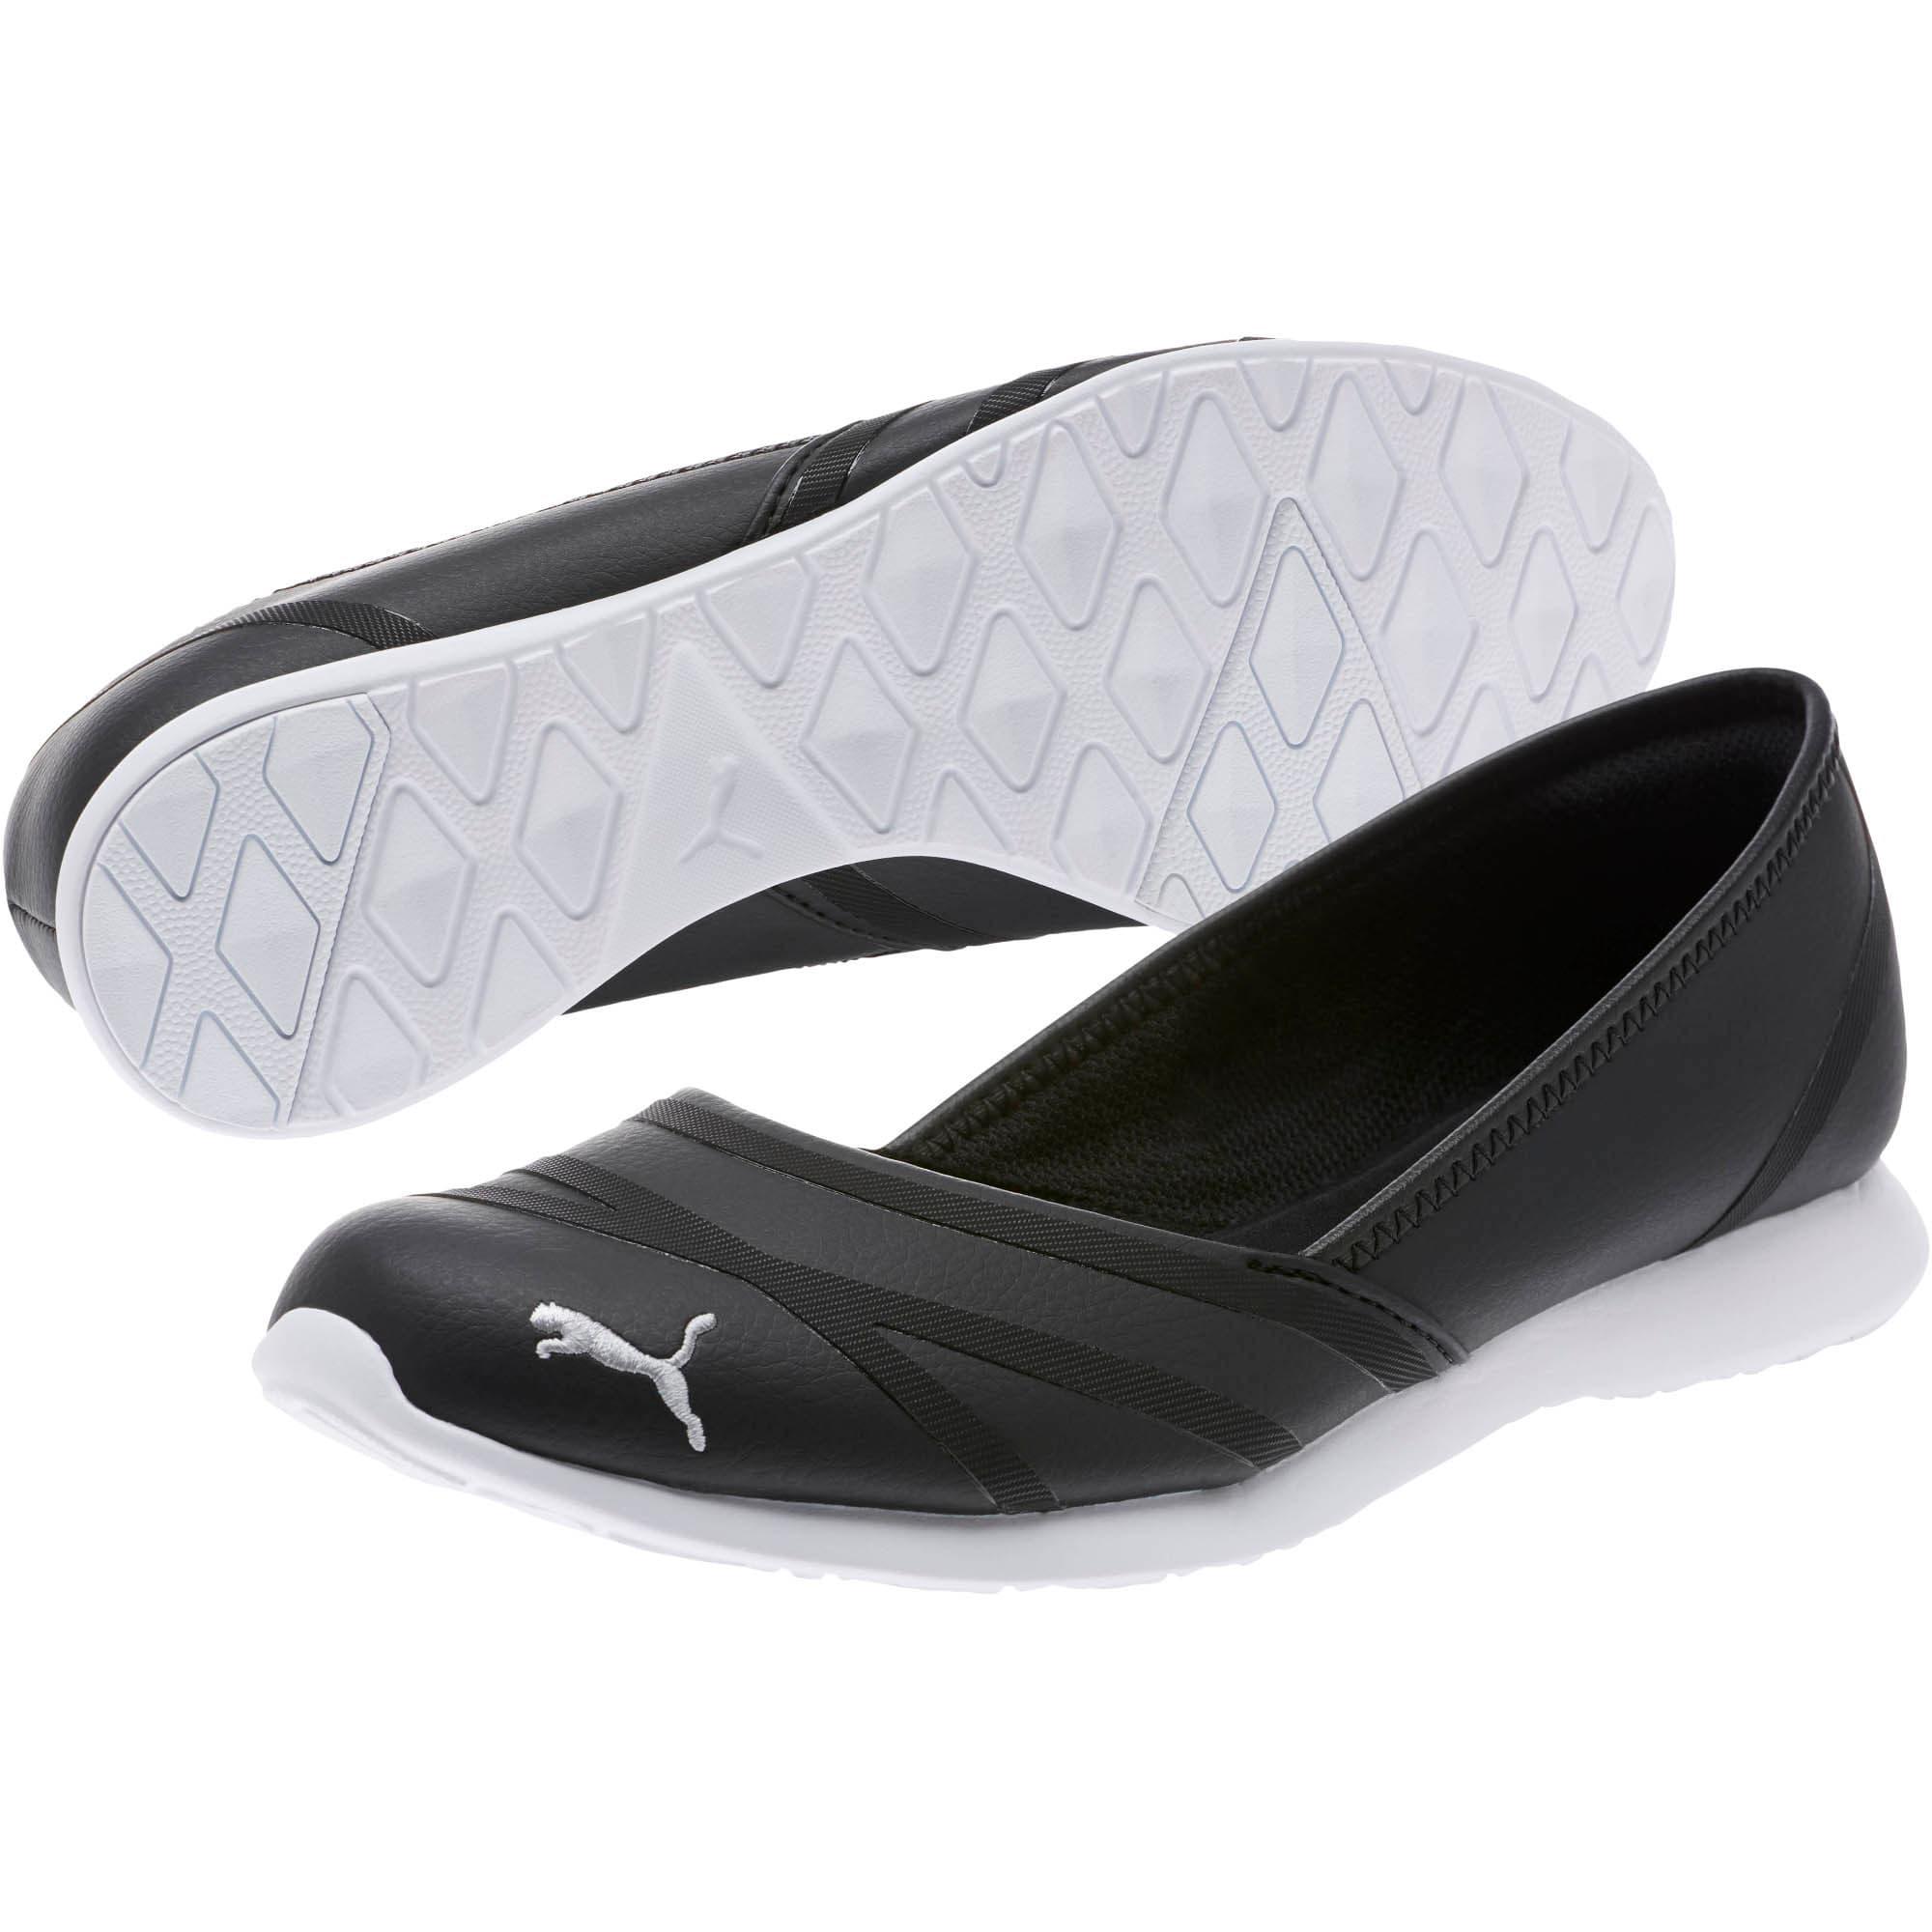 Thumbnail 2 of PUMA Vega Ballet Women's SL Shoes, Puma Black-Puma Black, medium